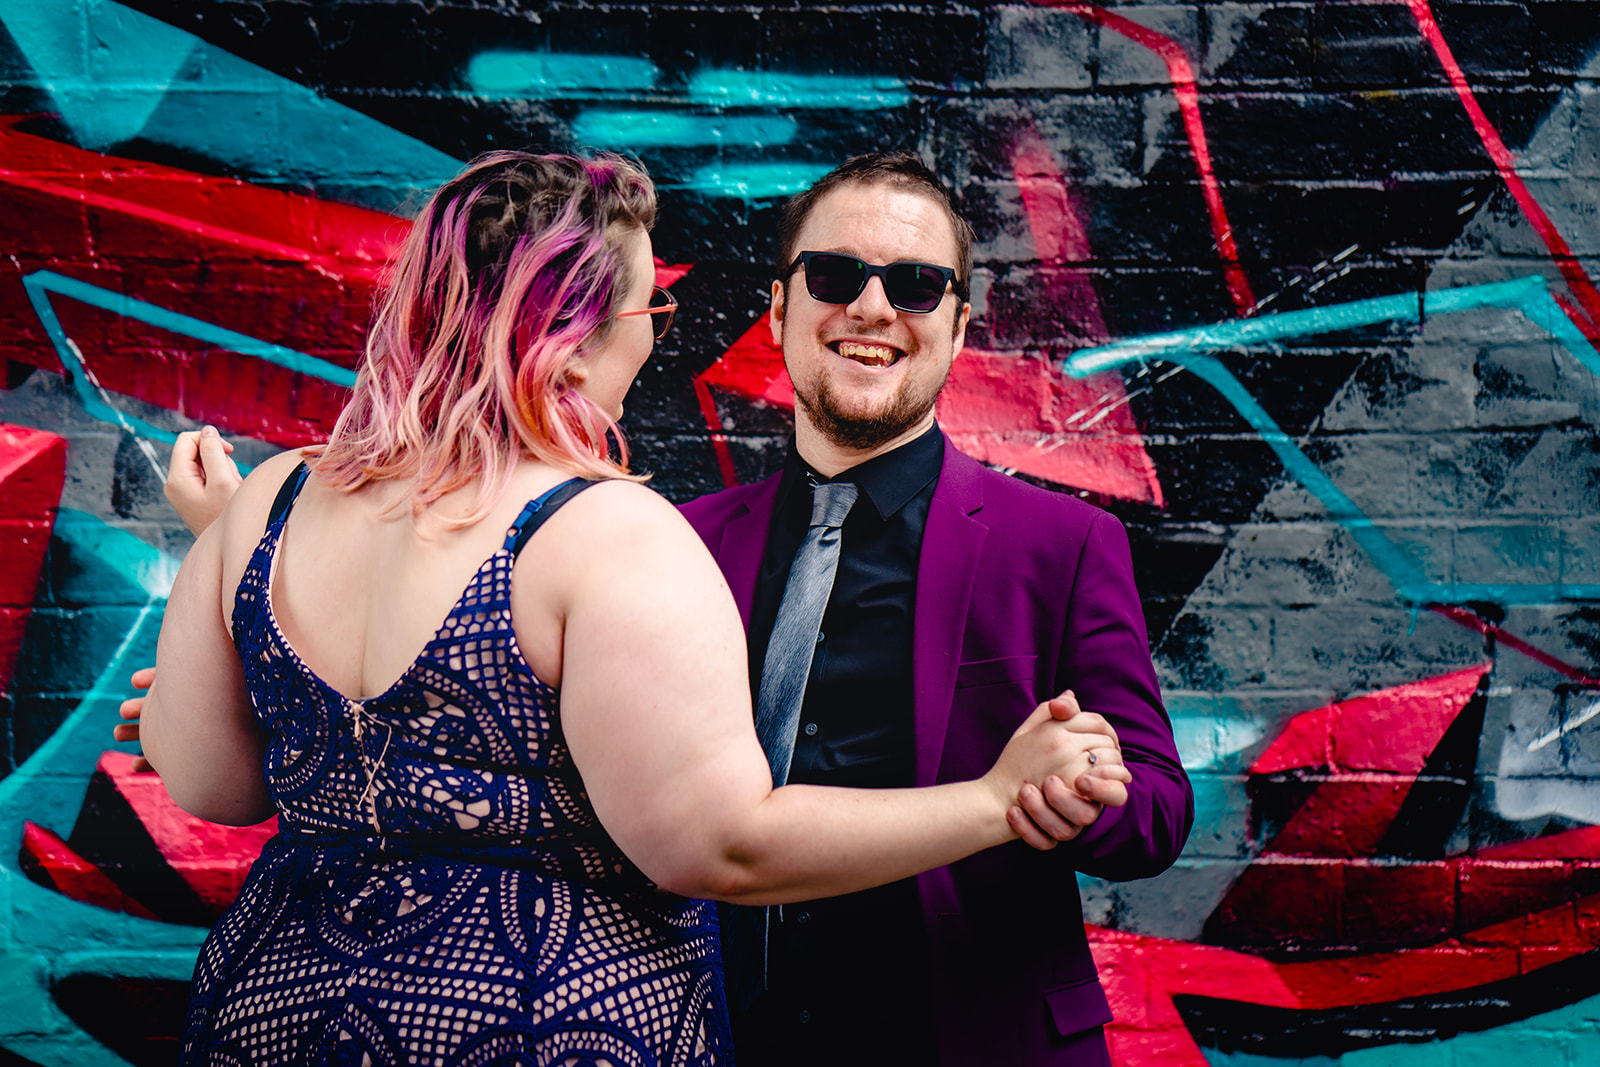 engagement shoots - birmingham engagement shoot - colourful wedding photoshoot - quirky wedding photos - fun wedding photography - alternative wedding - fun wedding photo